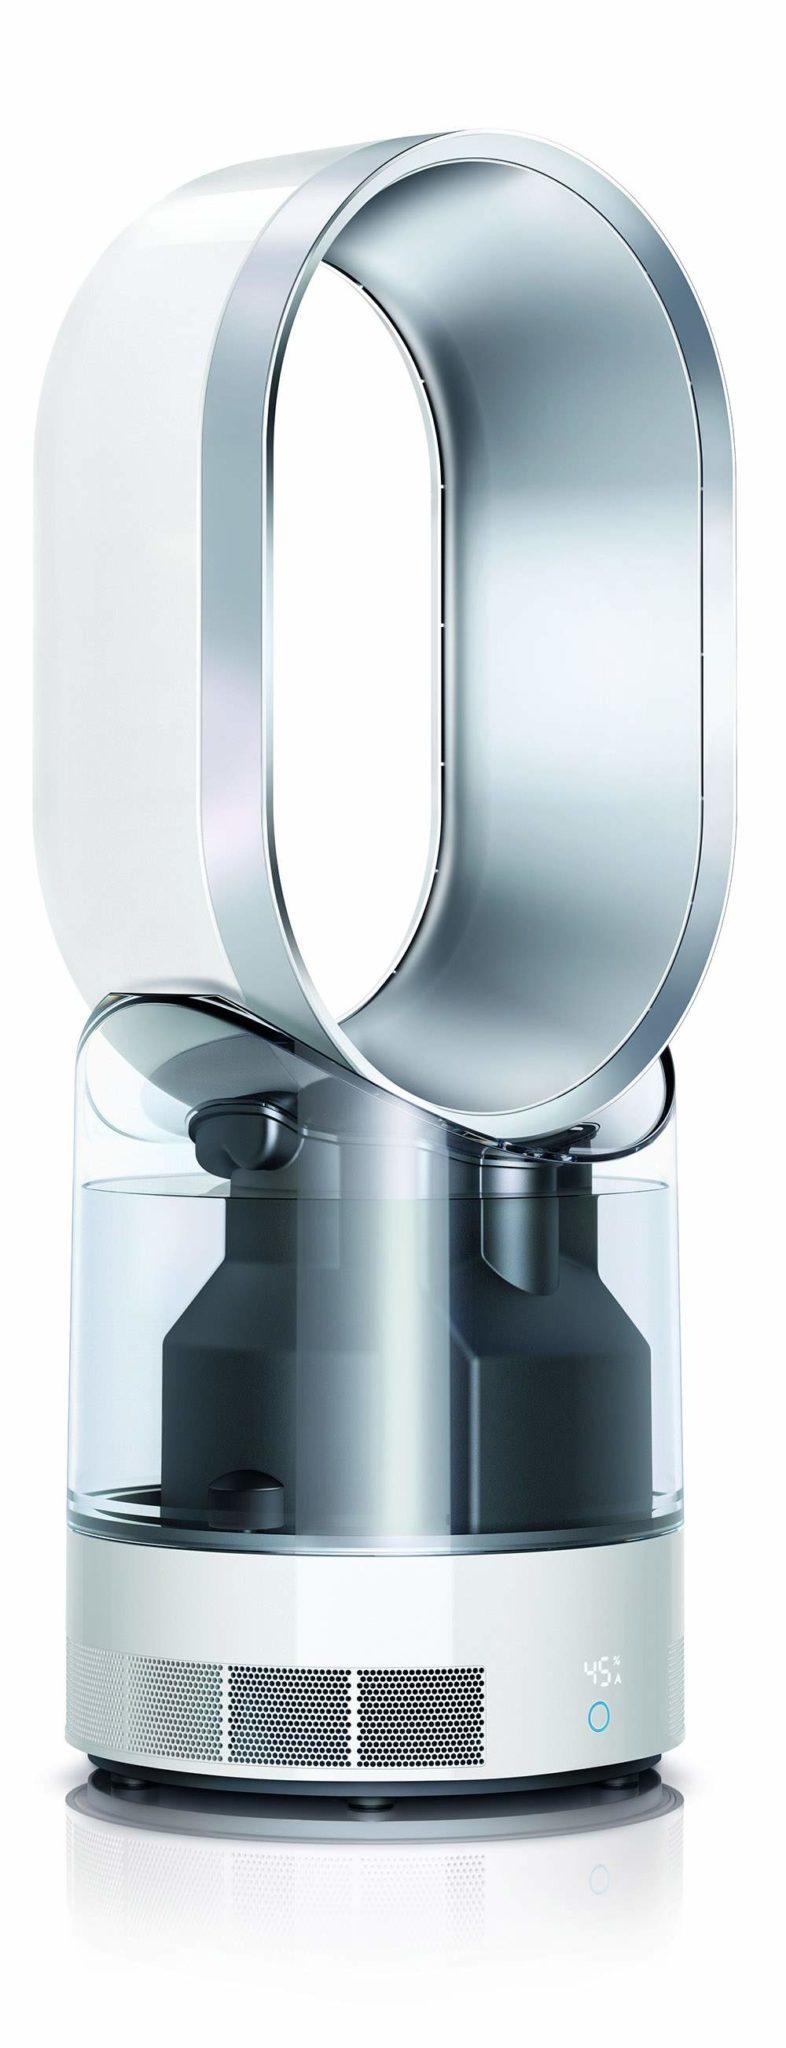 DYSON Humidifier AM10_profil_gauche